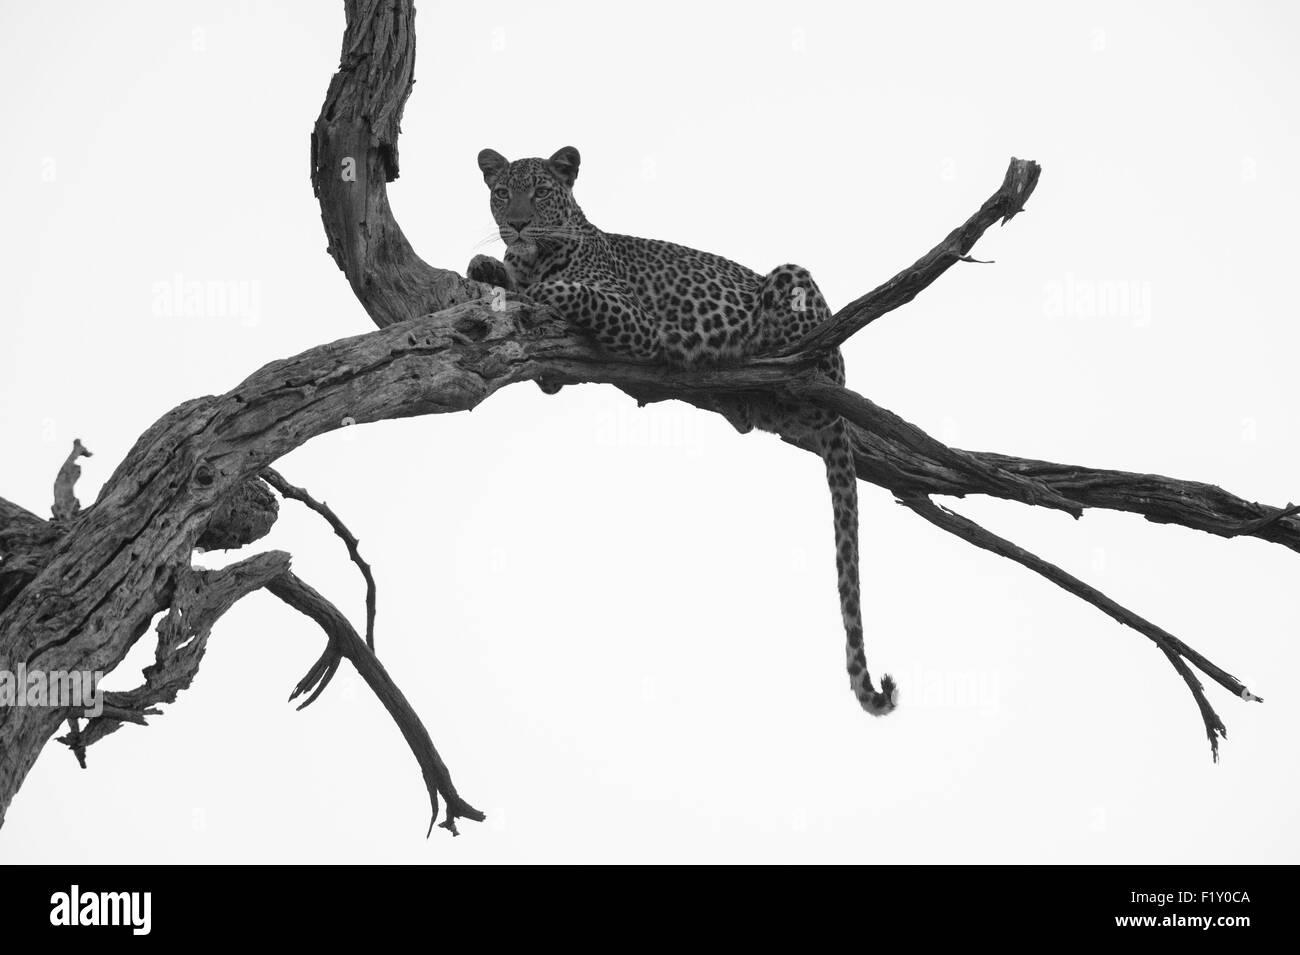 Botswana, Okavango Delta, listed as World Heritage by UNESCO, Khwai Concession, Leopard (Panthera pardus) - Stock Image